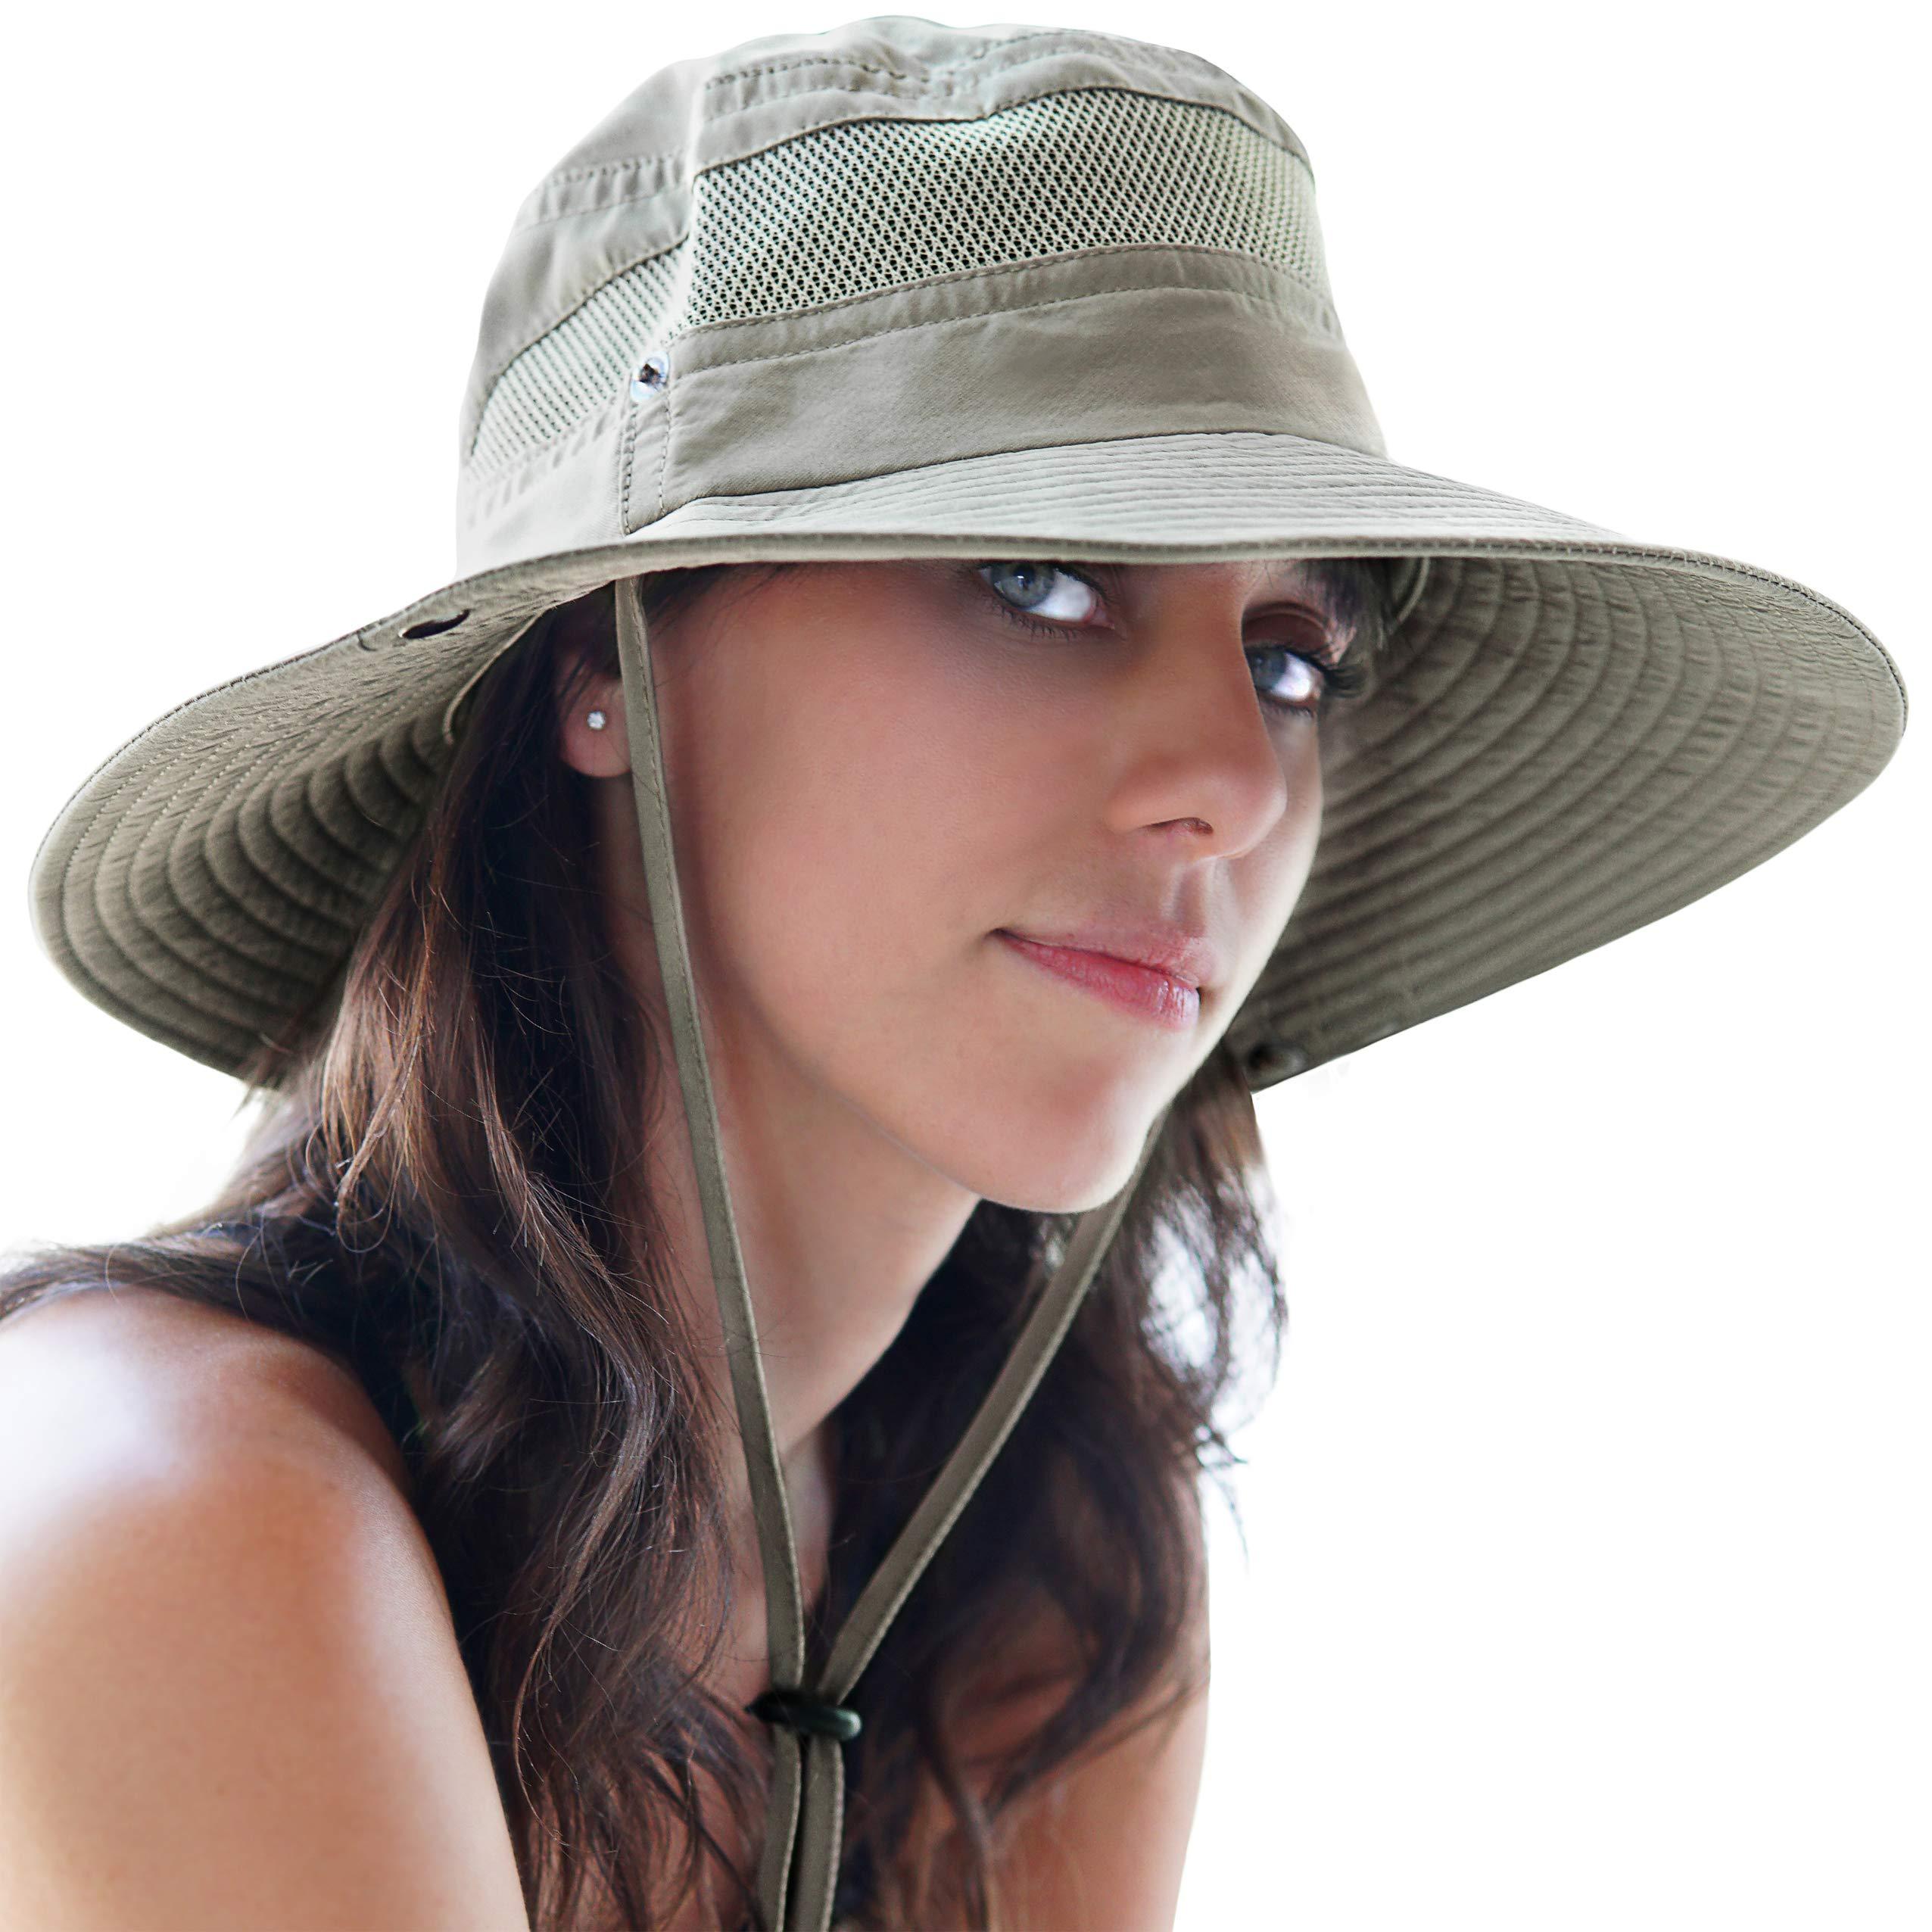 GearTOP Fishing Hat (Khaki - 2 Pack) by GearTOP (Image #2)